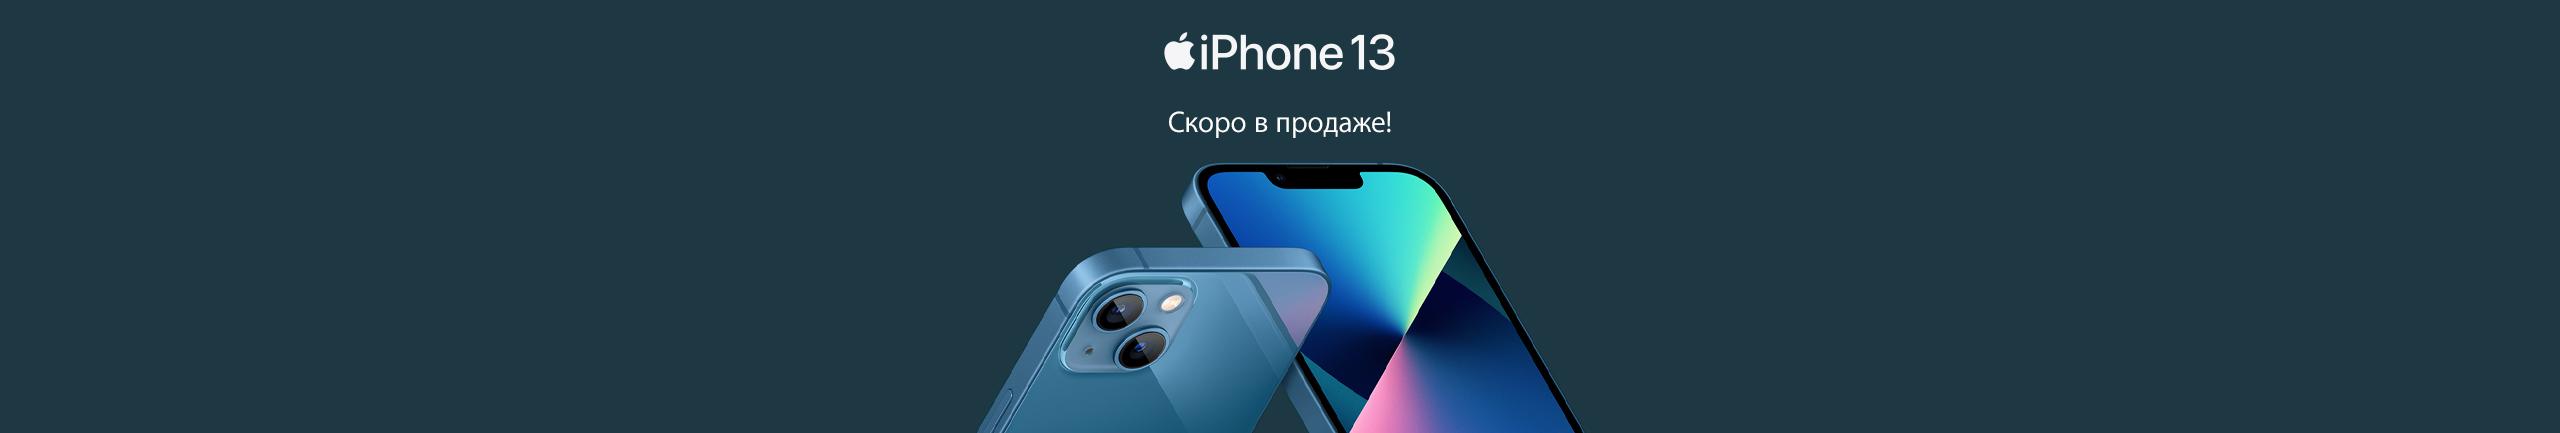 NPL Apple iPhone 13 и iPhone 12 Mini cкоро в продаже